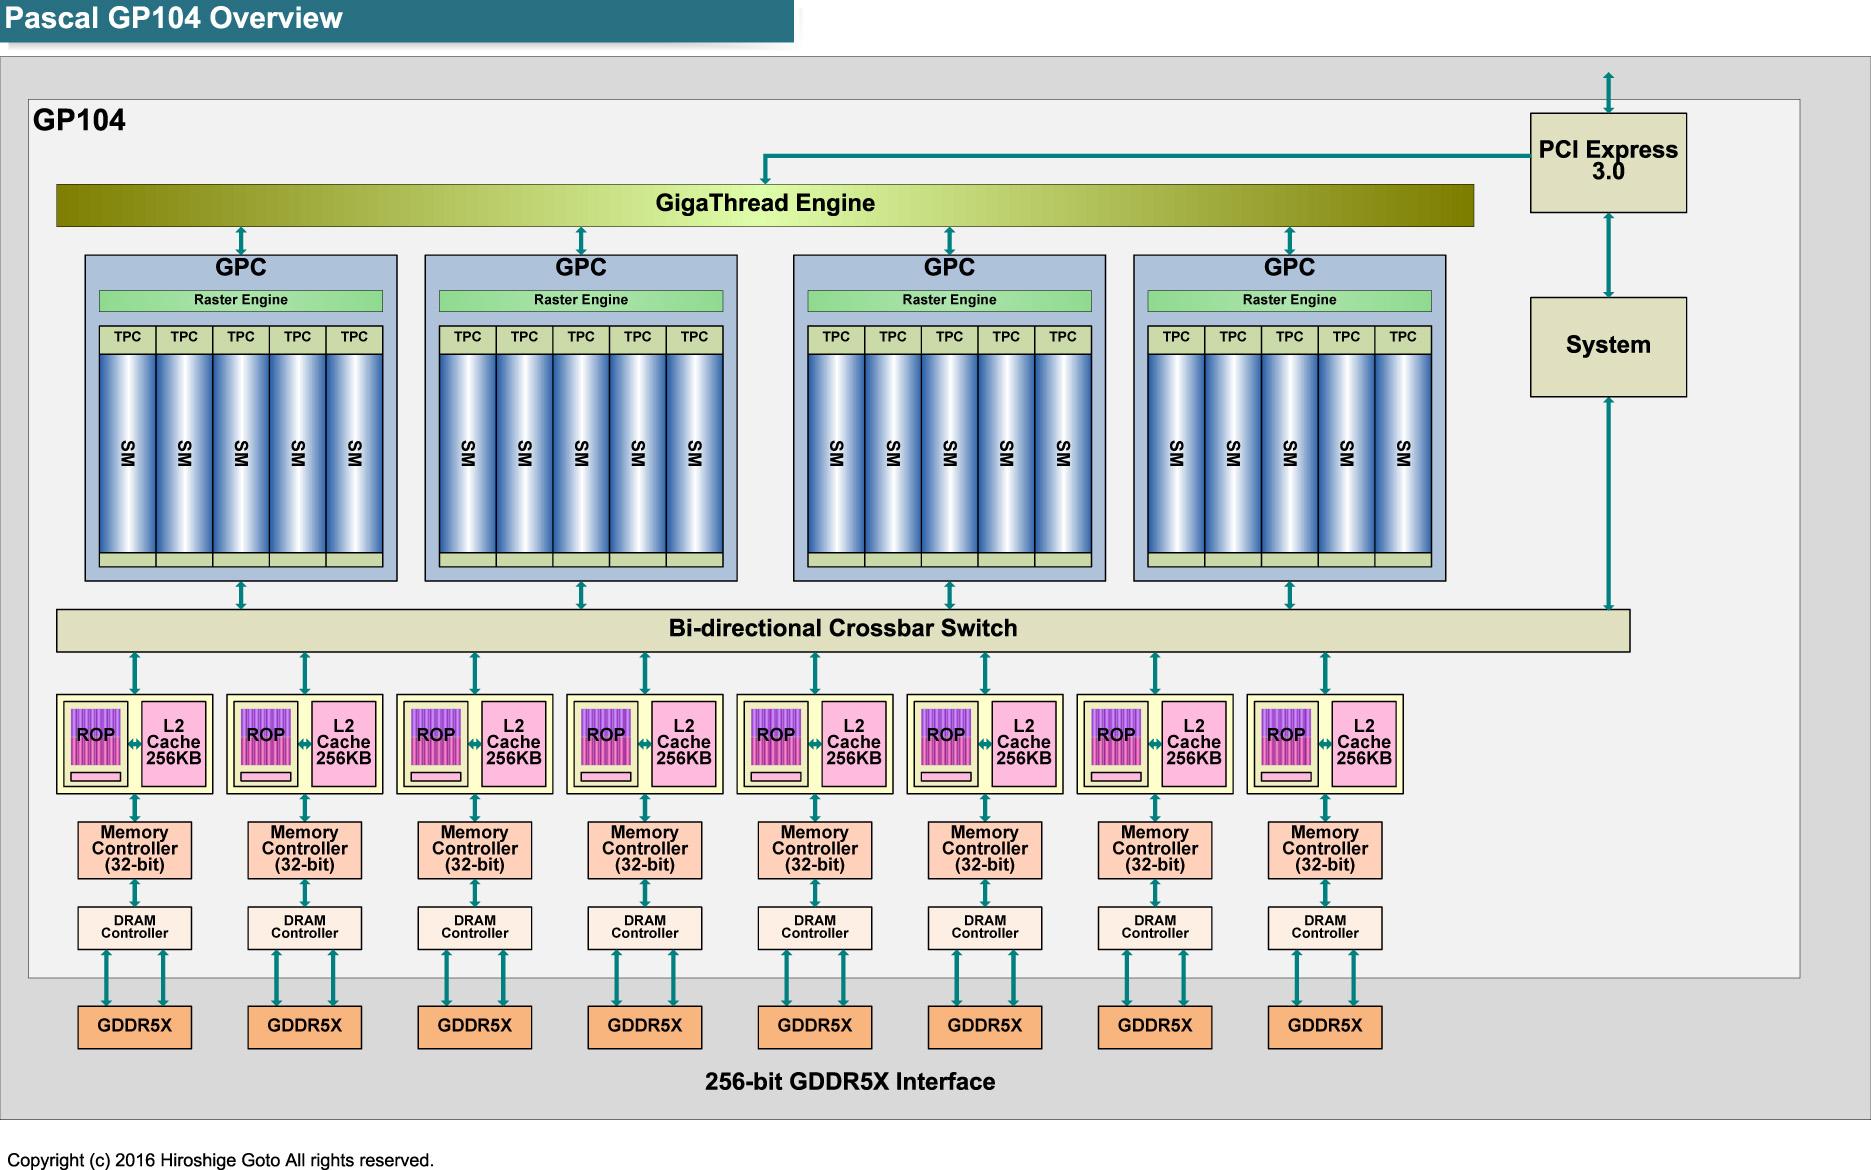 "GeForce GTX 1080の全体ブロック図<br class="""">PDF版は<span class=""img-inline raw""><a href=""/video/pcw/docs/757/916/p19.pdf"" ipw_status=""1"" ipw_linktype=""filelink_raw"" class=""resource"">こちら</a></span>"